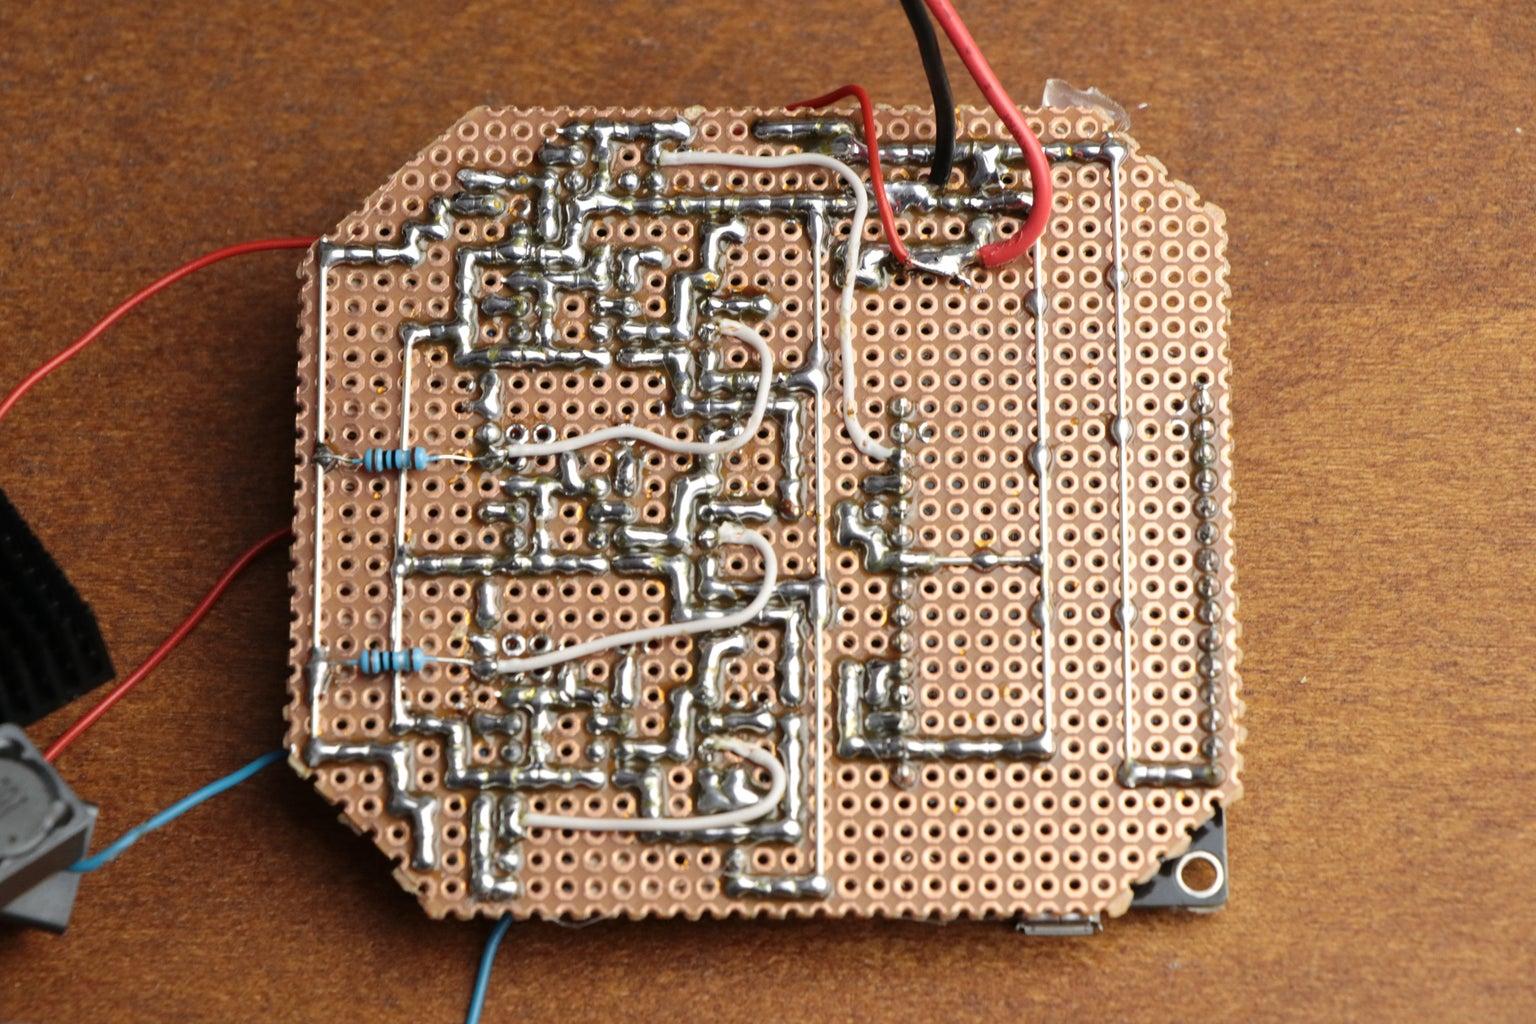 Create the Circuit!